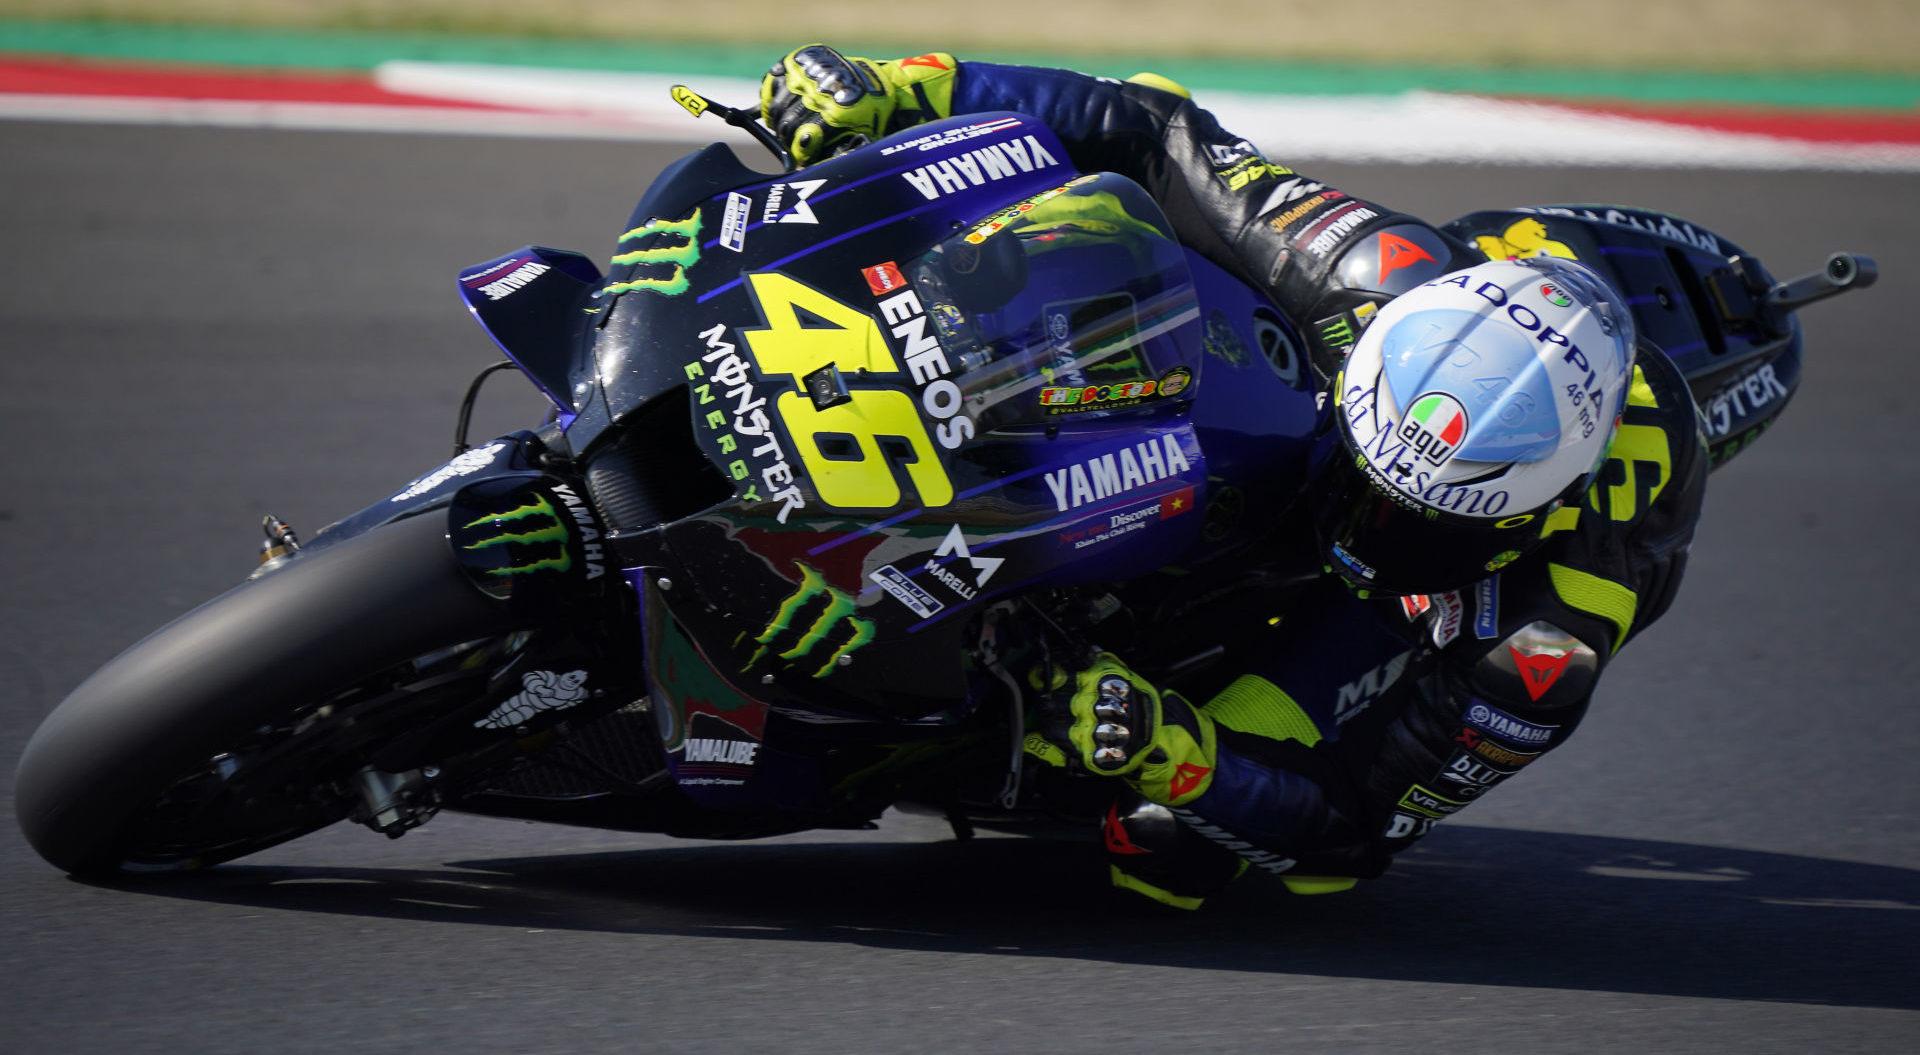 Valentino Rossi (46) at speed at Misano. Photo courtesy Monster Energy Yamaha.